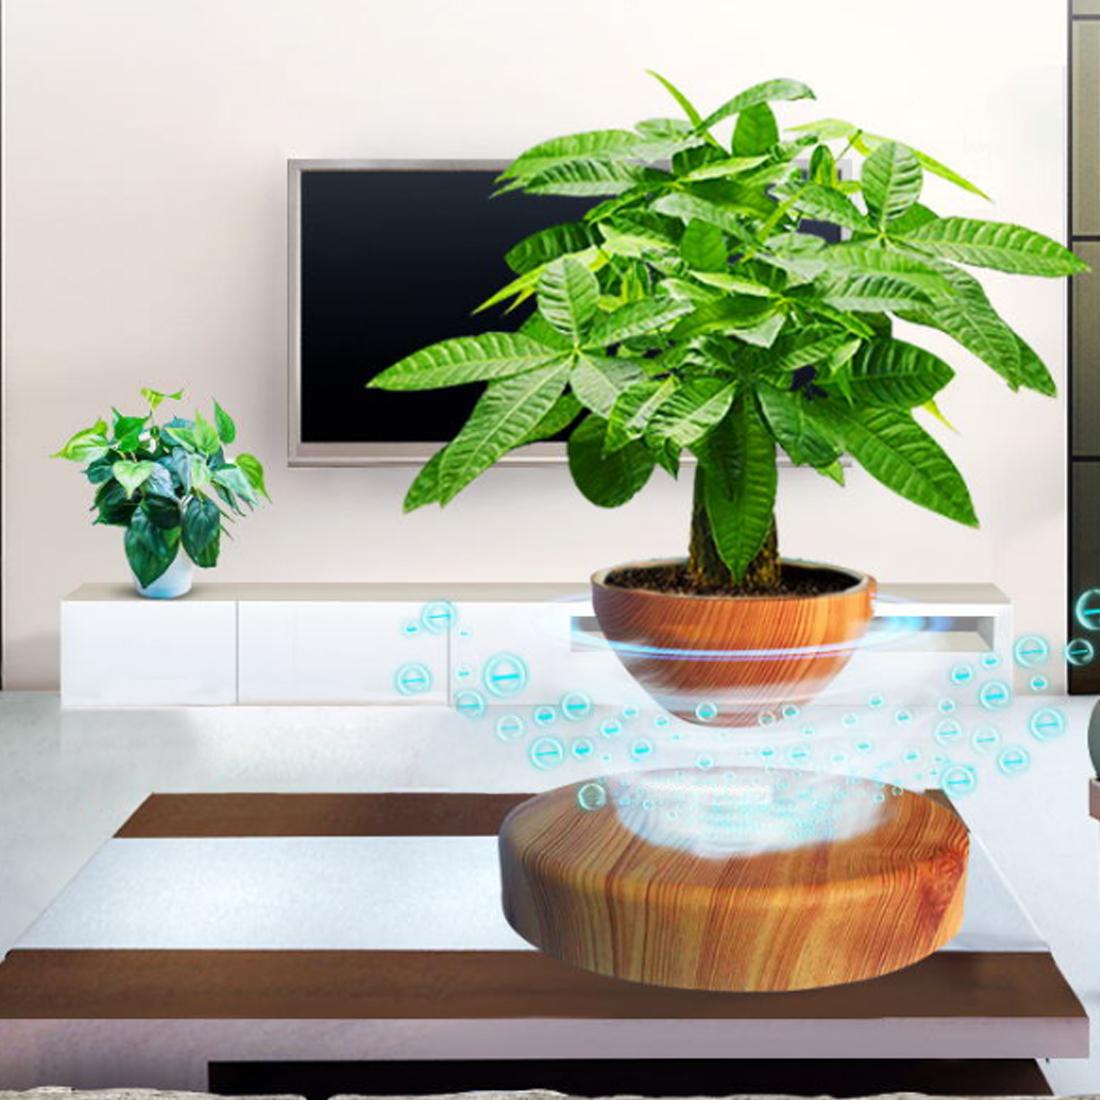 Potted Plant Ornaments Creative Magnetic Levitation Air Bonsai Art Wood Grain With EU Plug Geomancy Office Table Home Decor